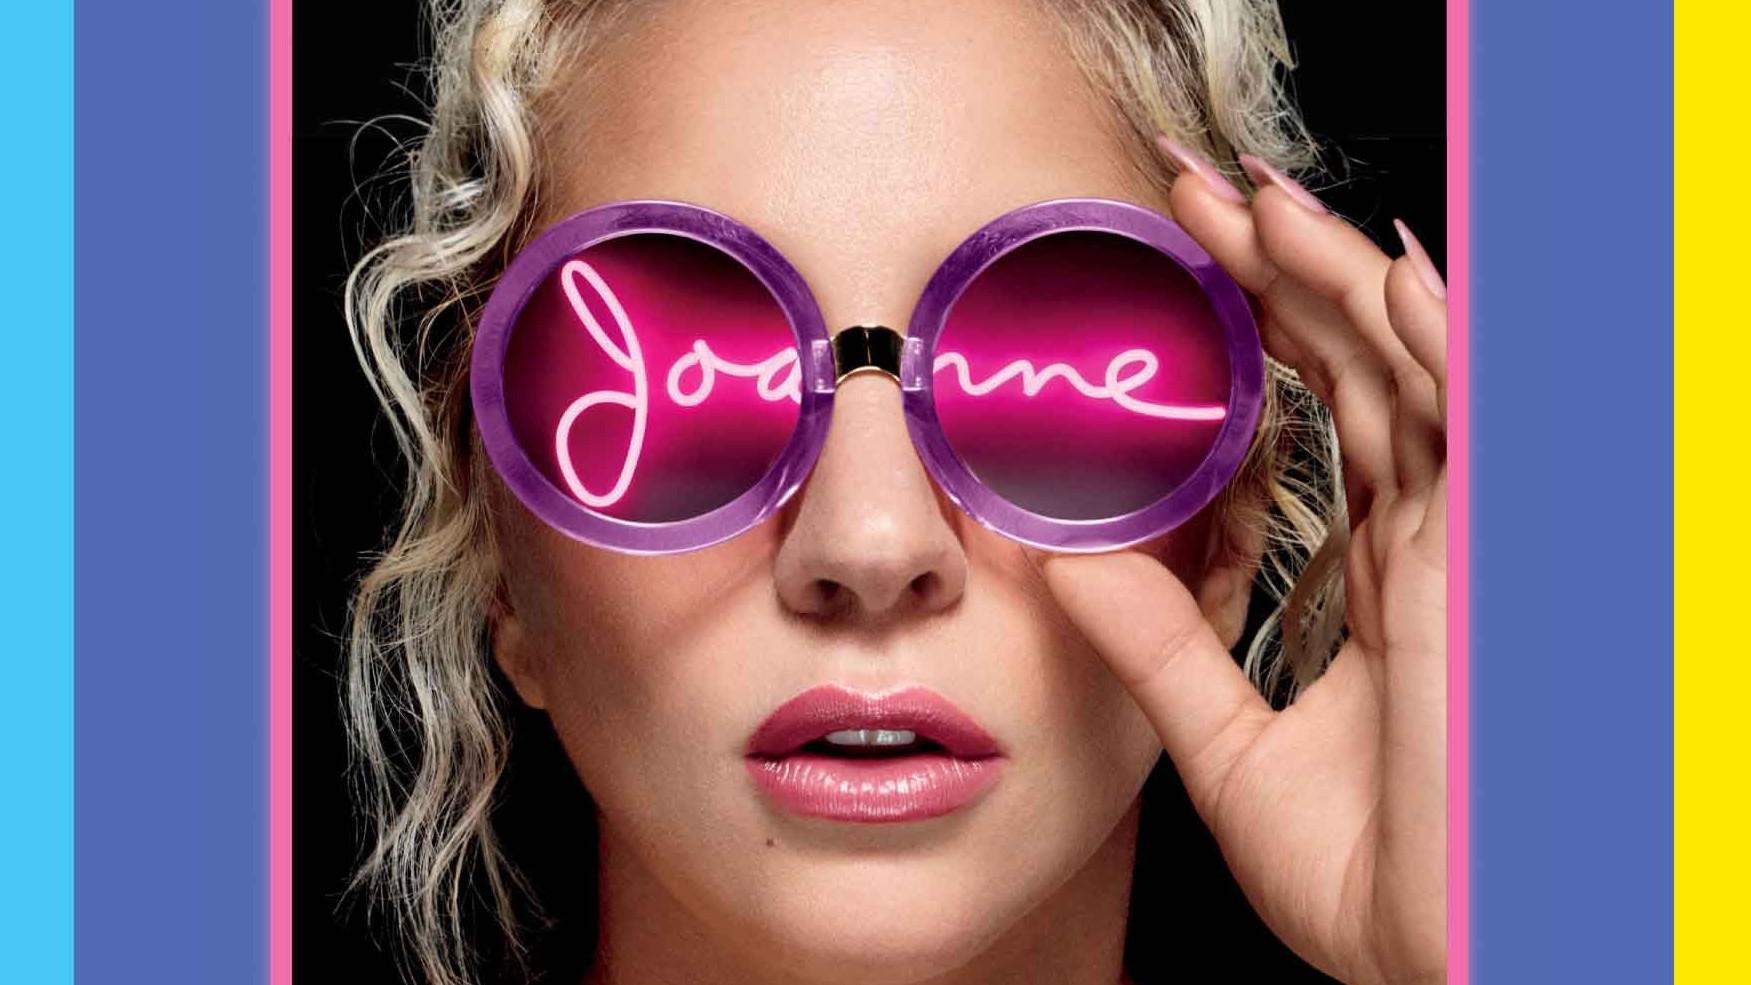 Lady Gaga retoma su gira europea: actuará en Barcelona en enero